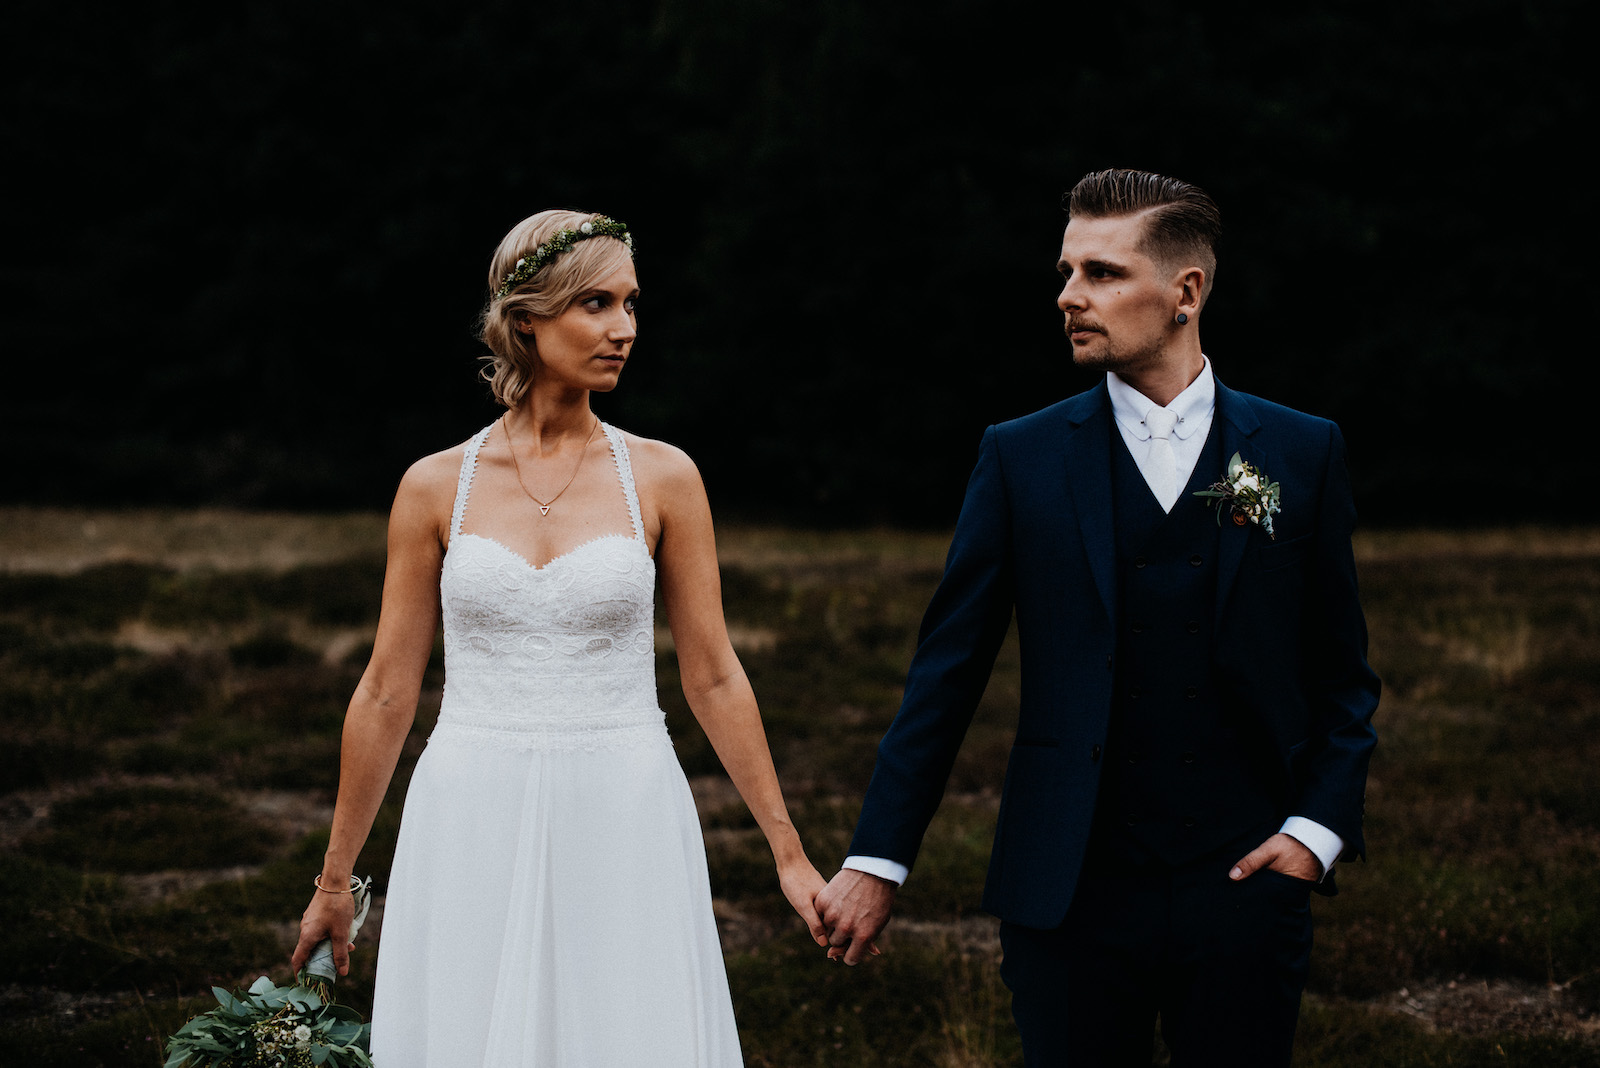 Brautpaarshoot-Lueneburger-Heide